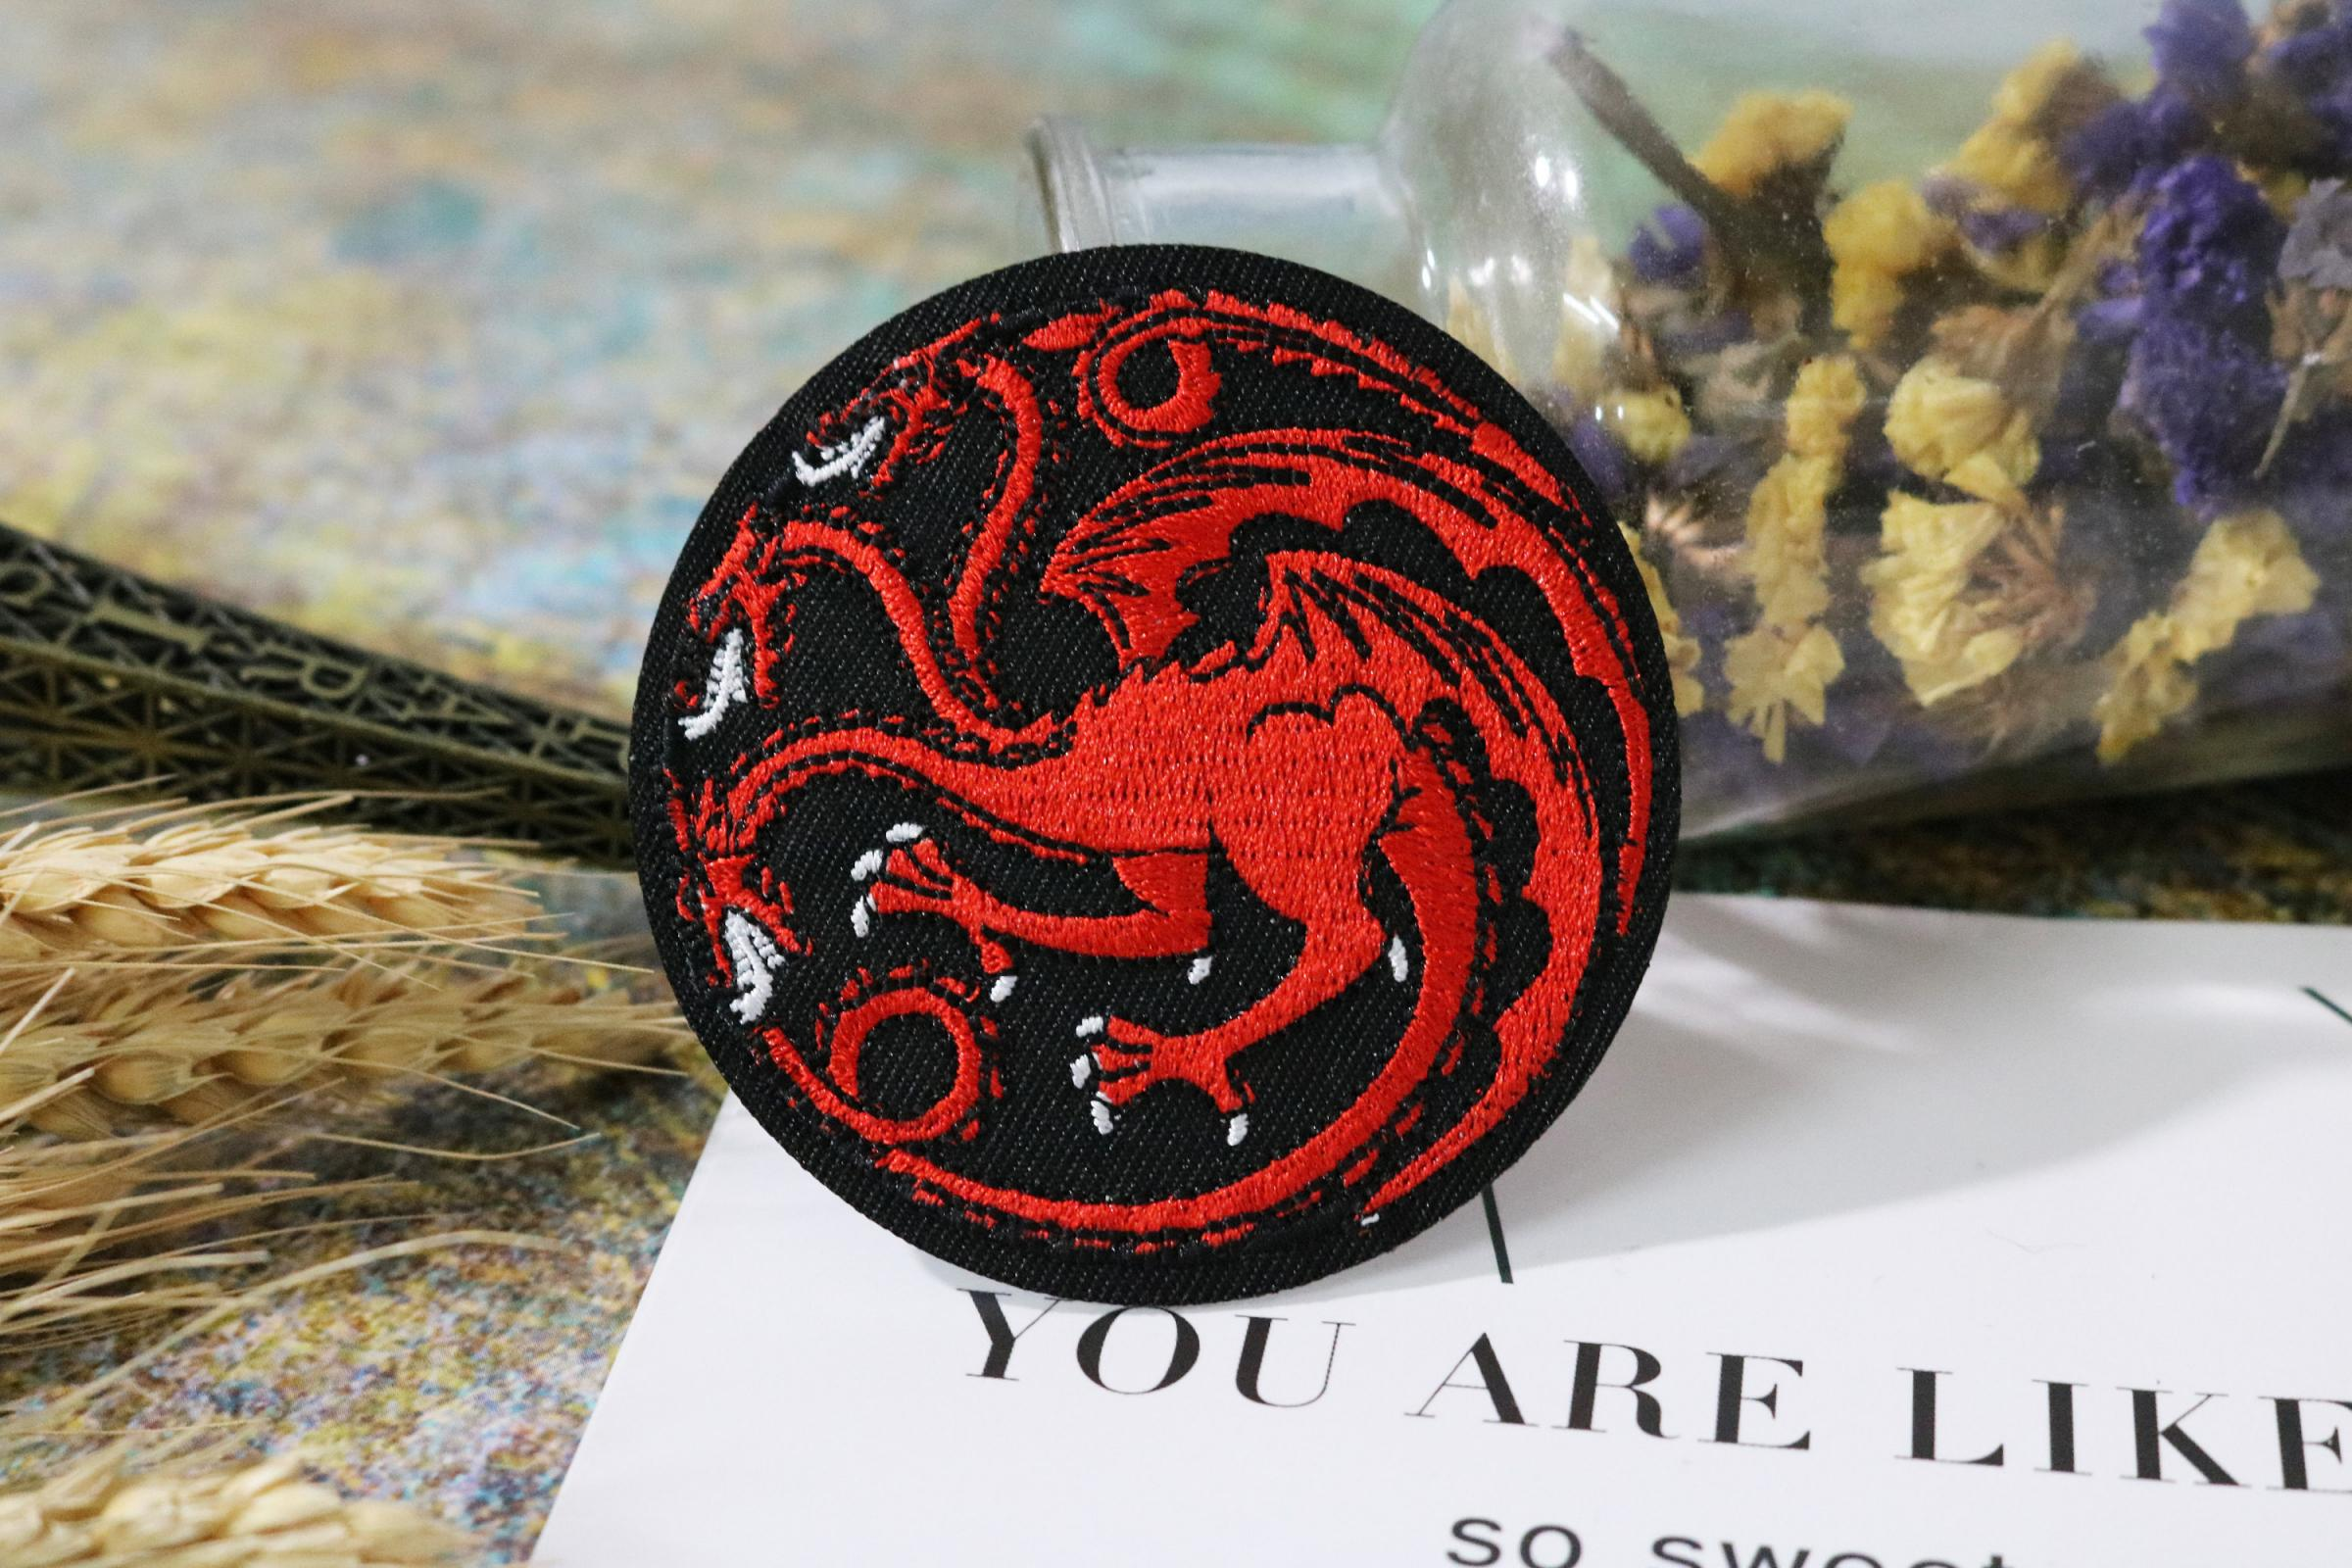 House Targaryen logo design